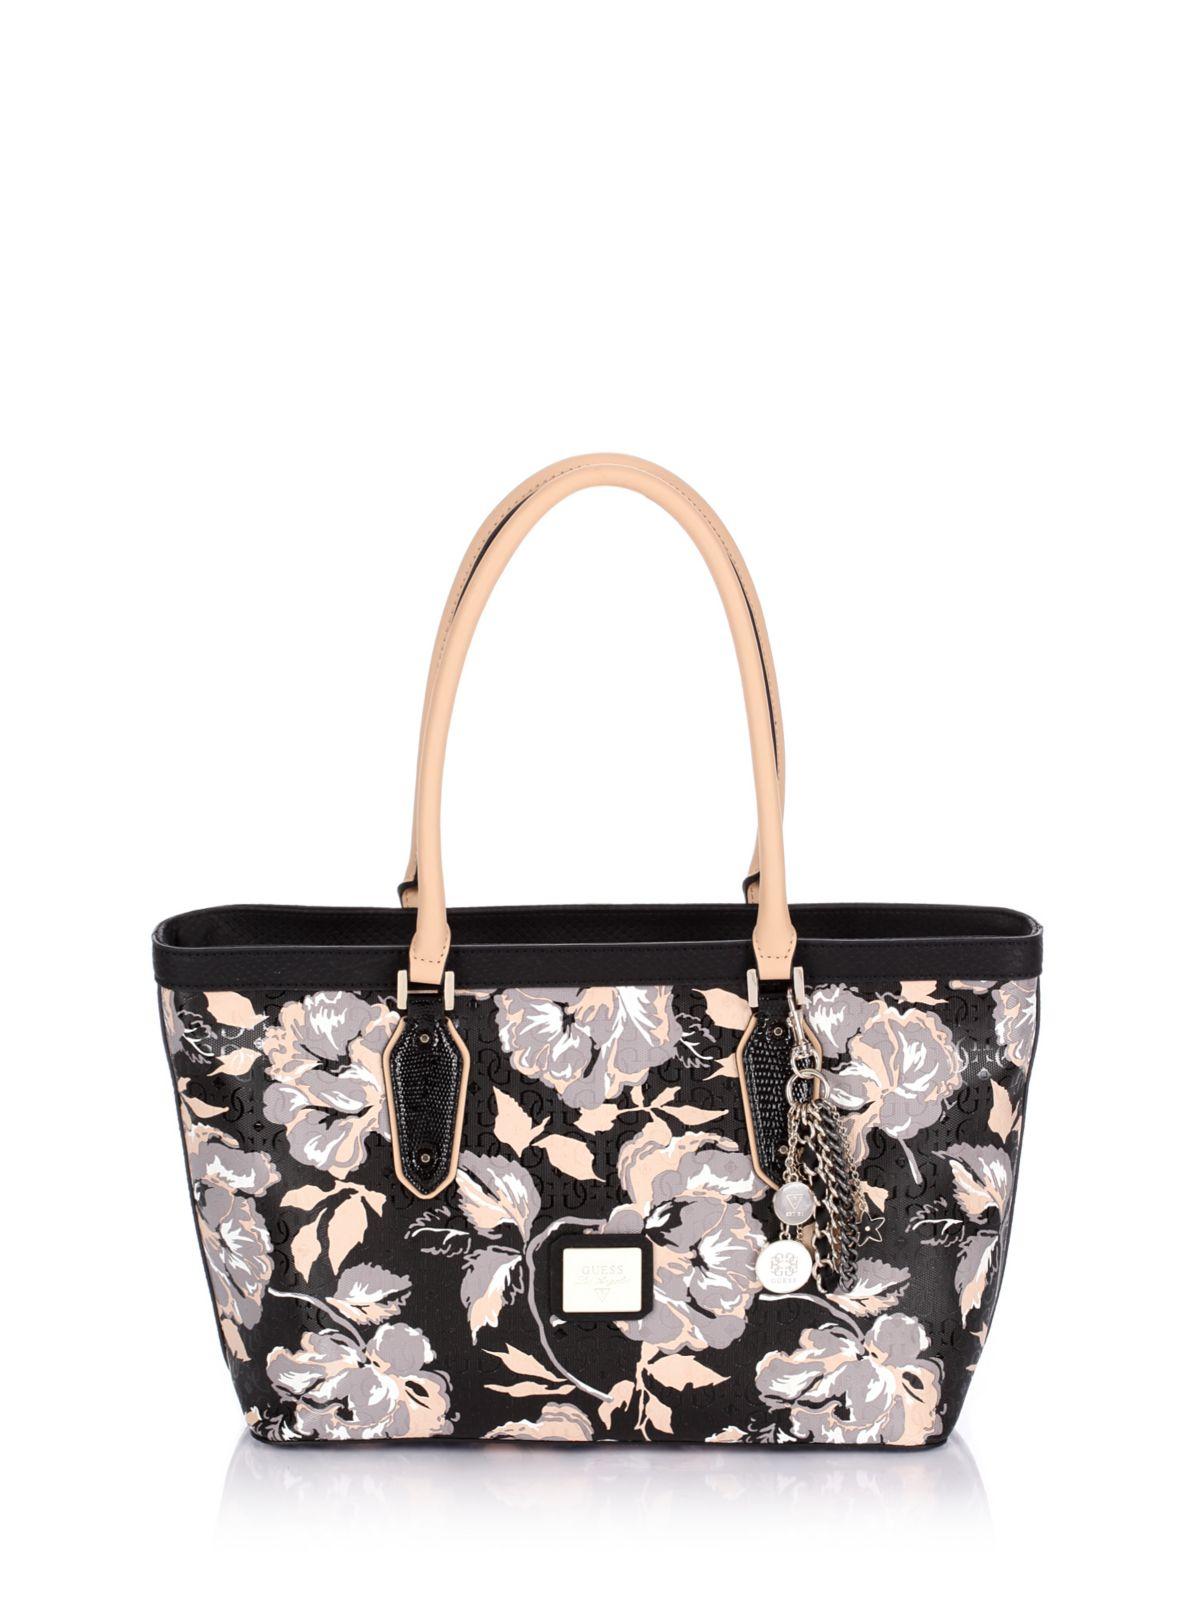 Guess Blossom Medium Classic Floral Tote Bag | Lyst